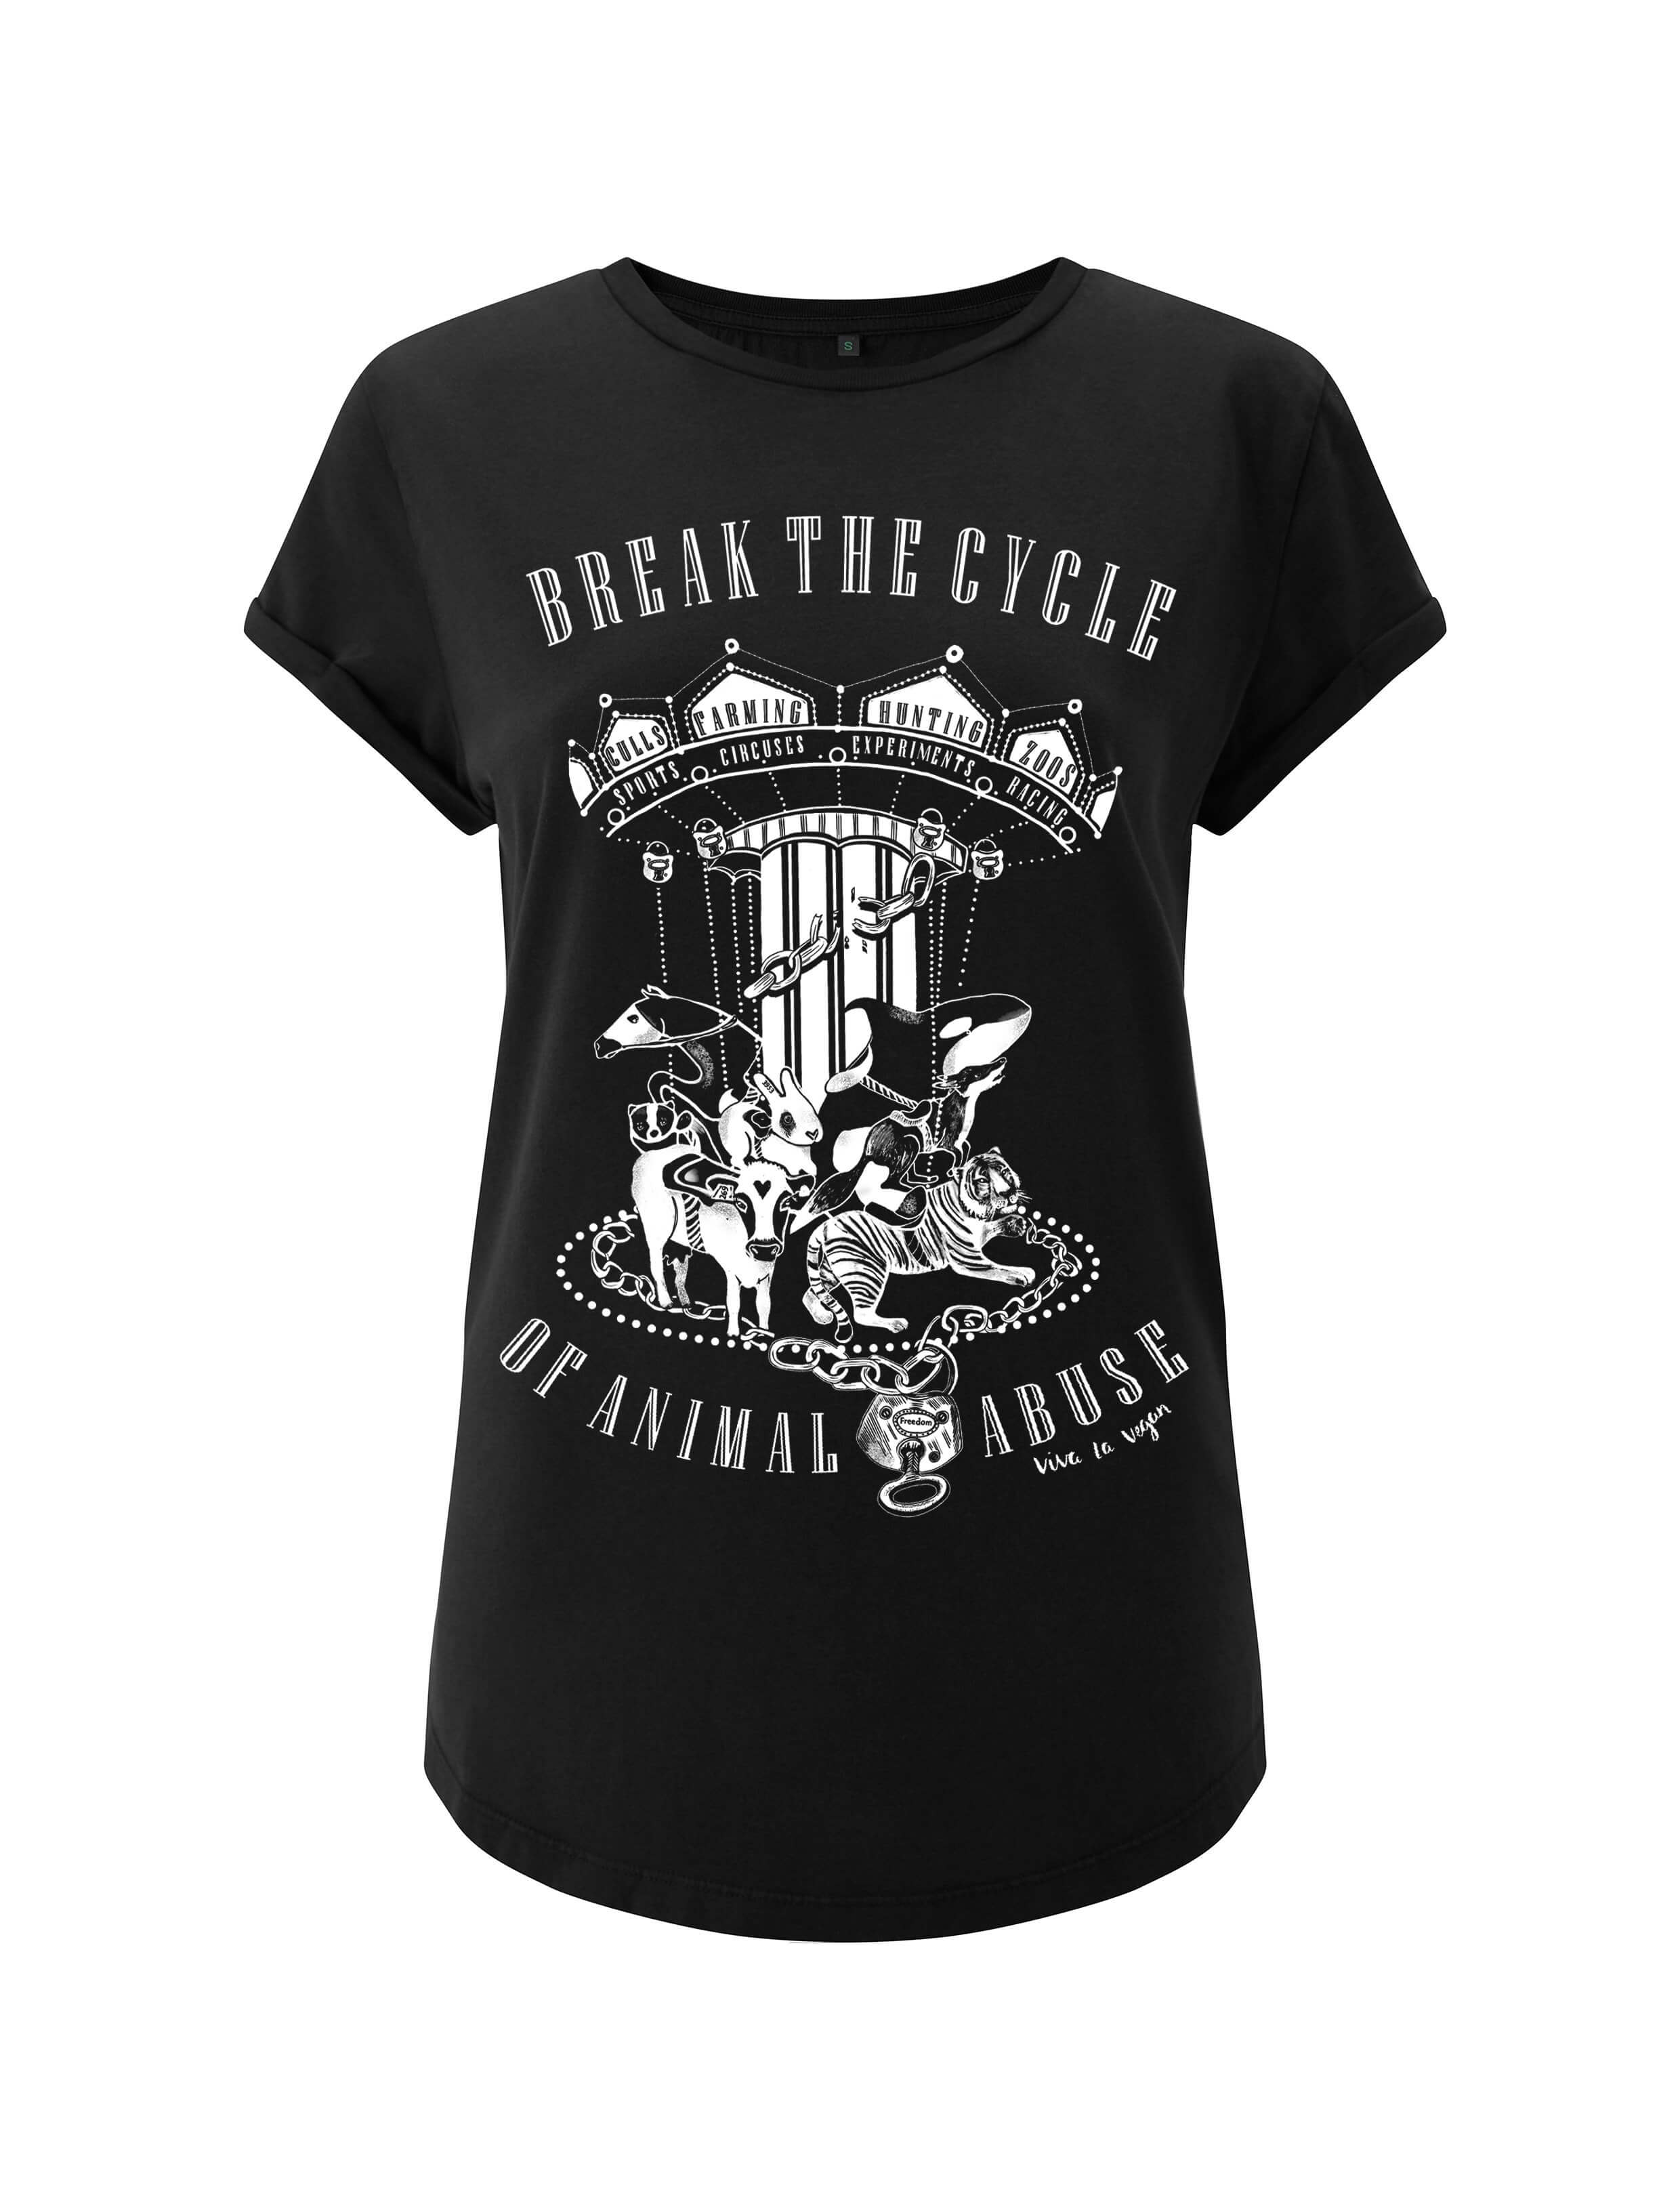 Women's Tshirt : Break The Cycle